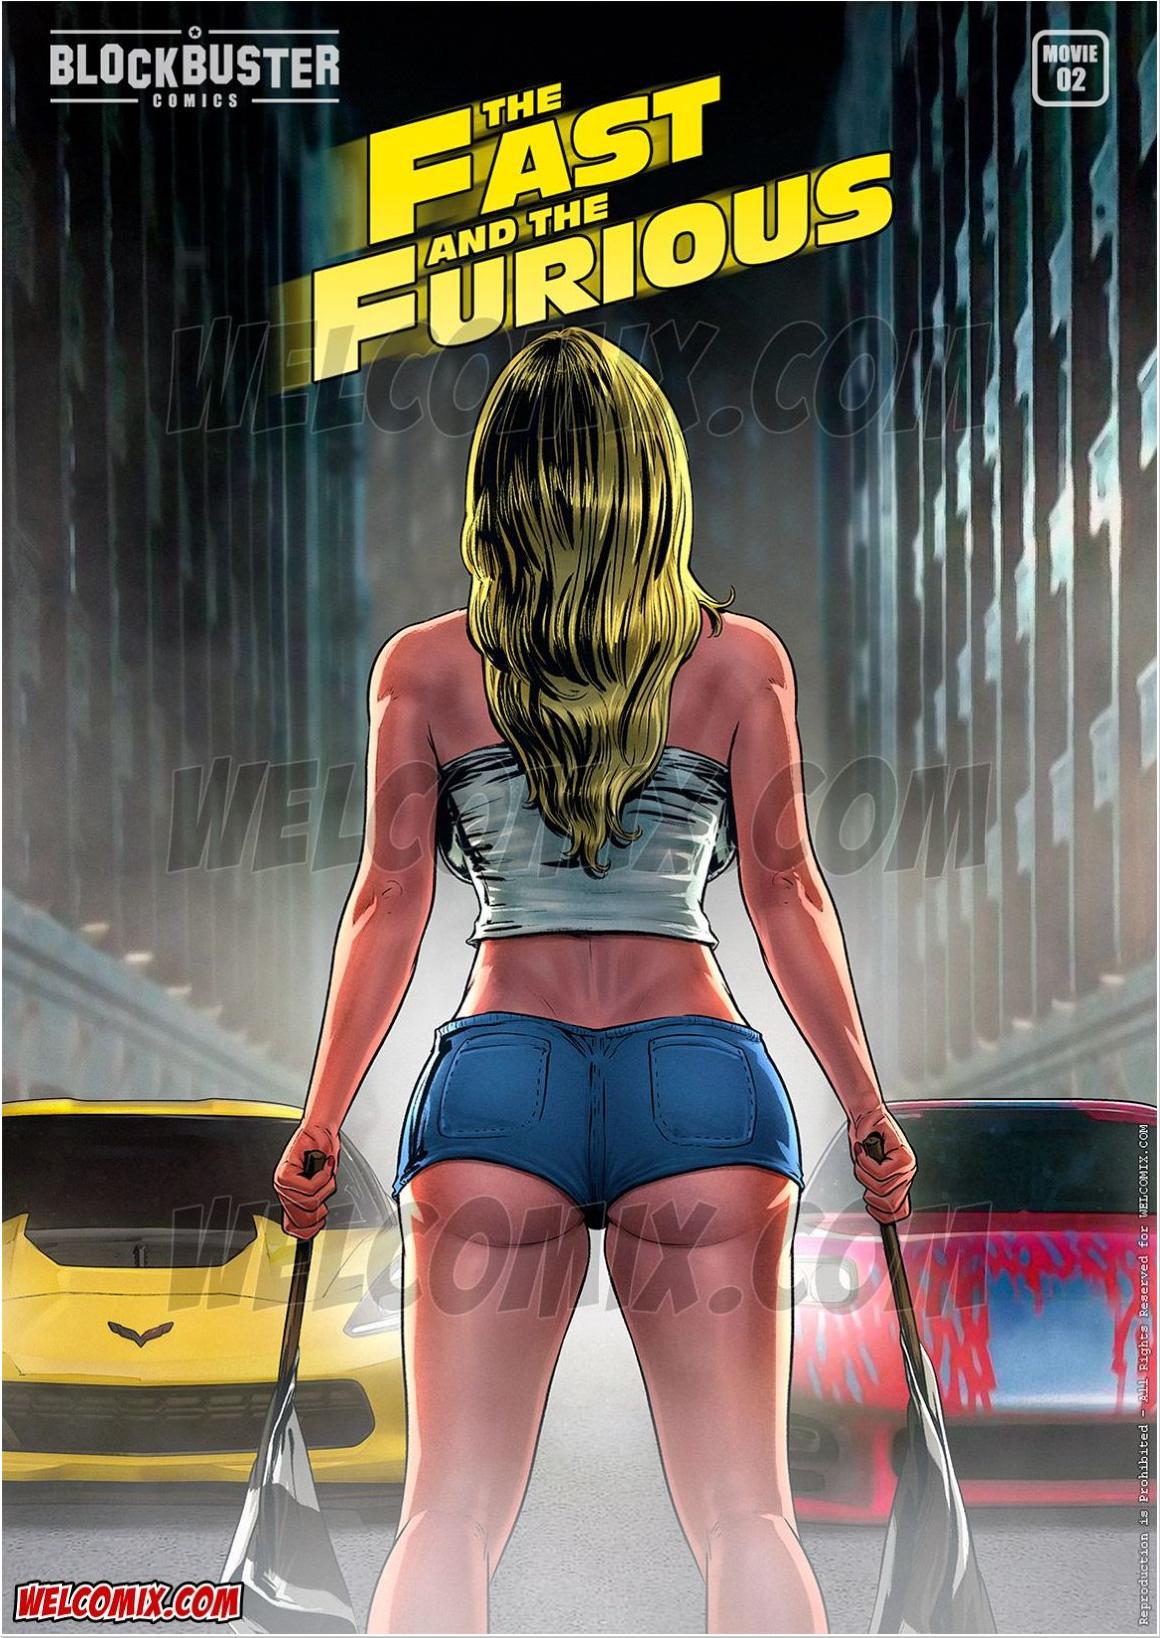 SureFap xxx porno The Fast and the Furious - [WelComix] - BlockBuster Comics 02 - The Fast and The Furious